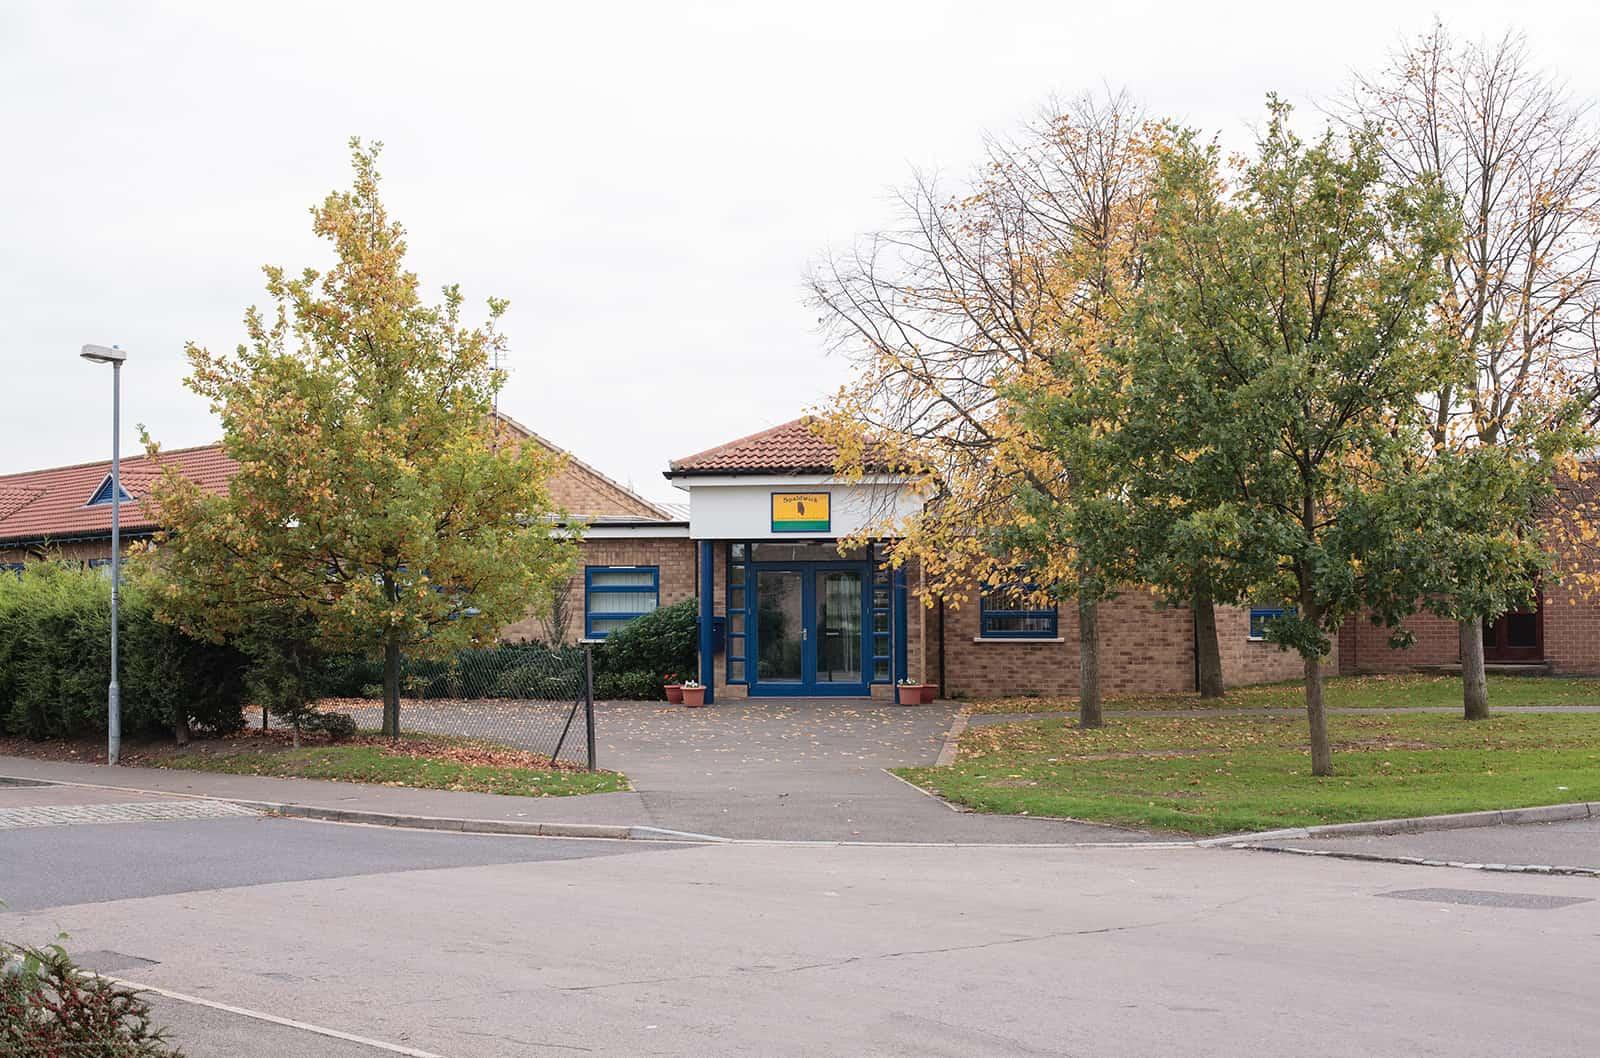 Spaldwick School